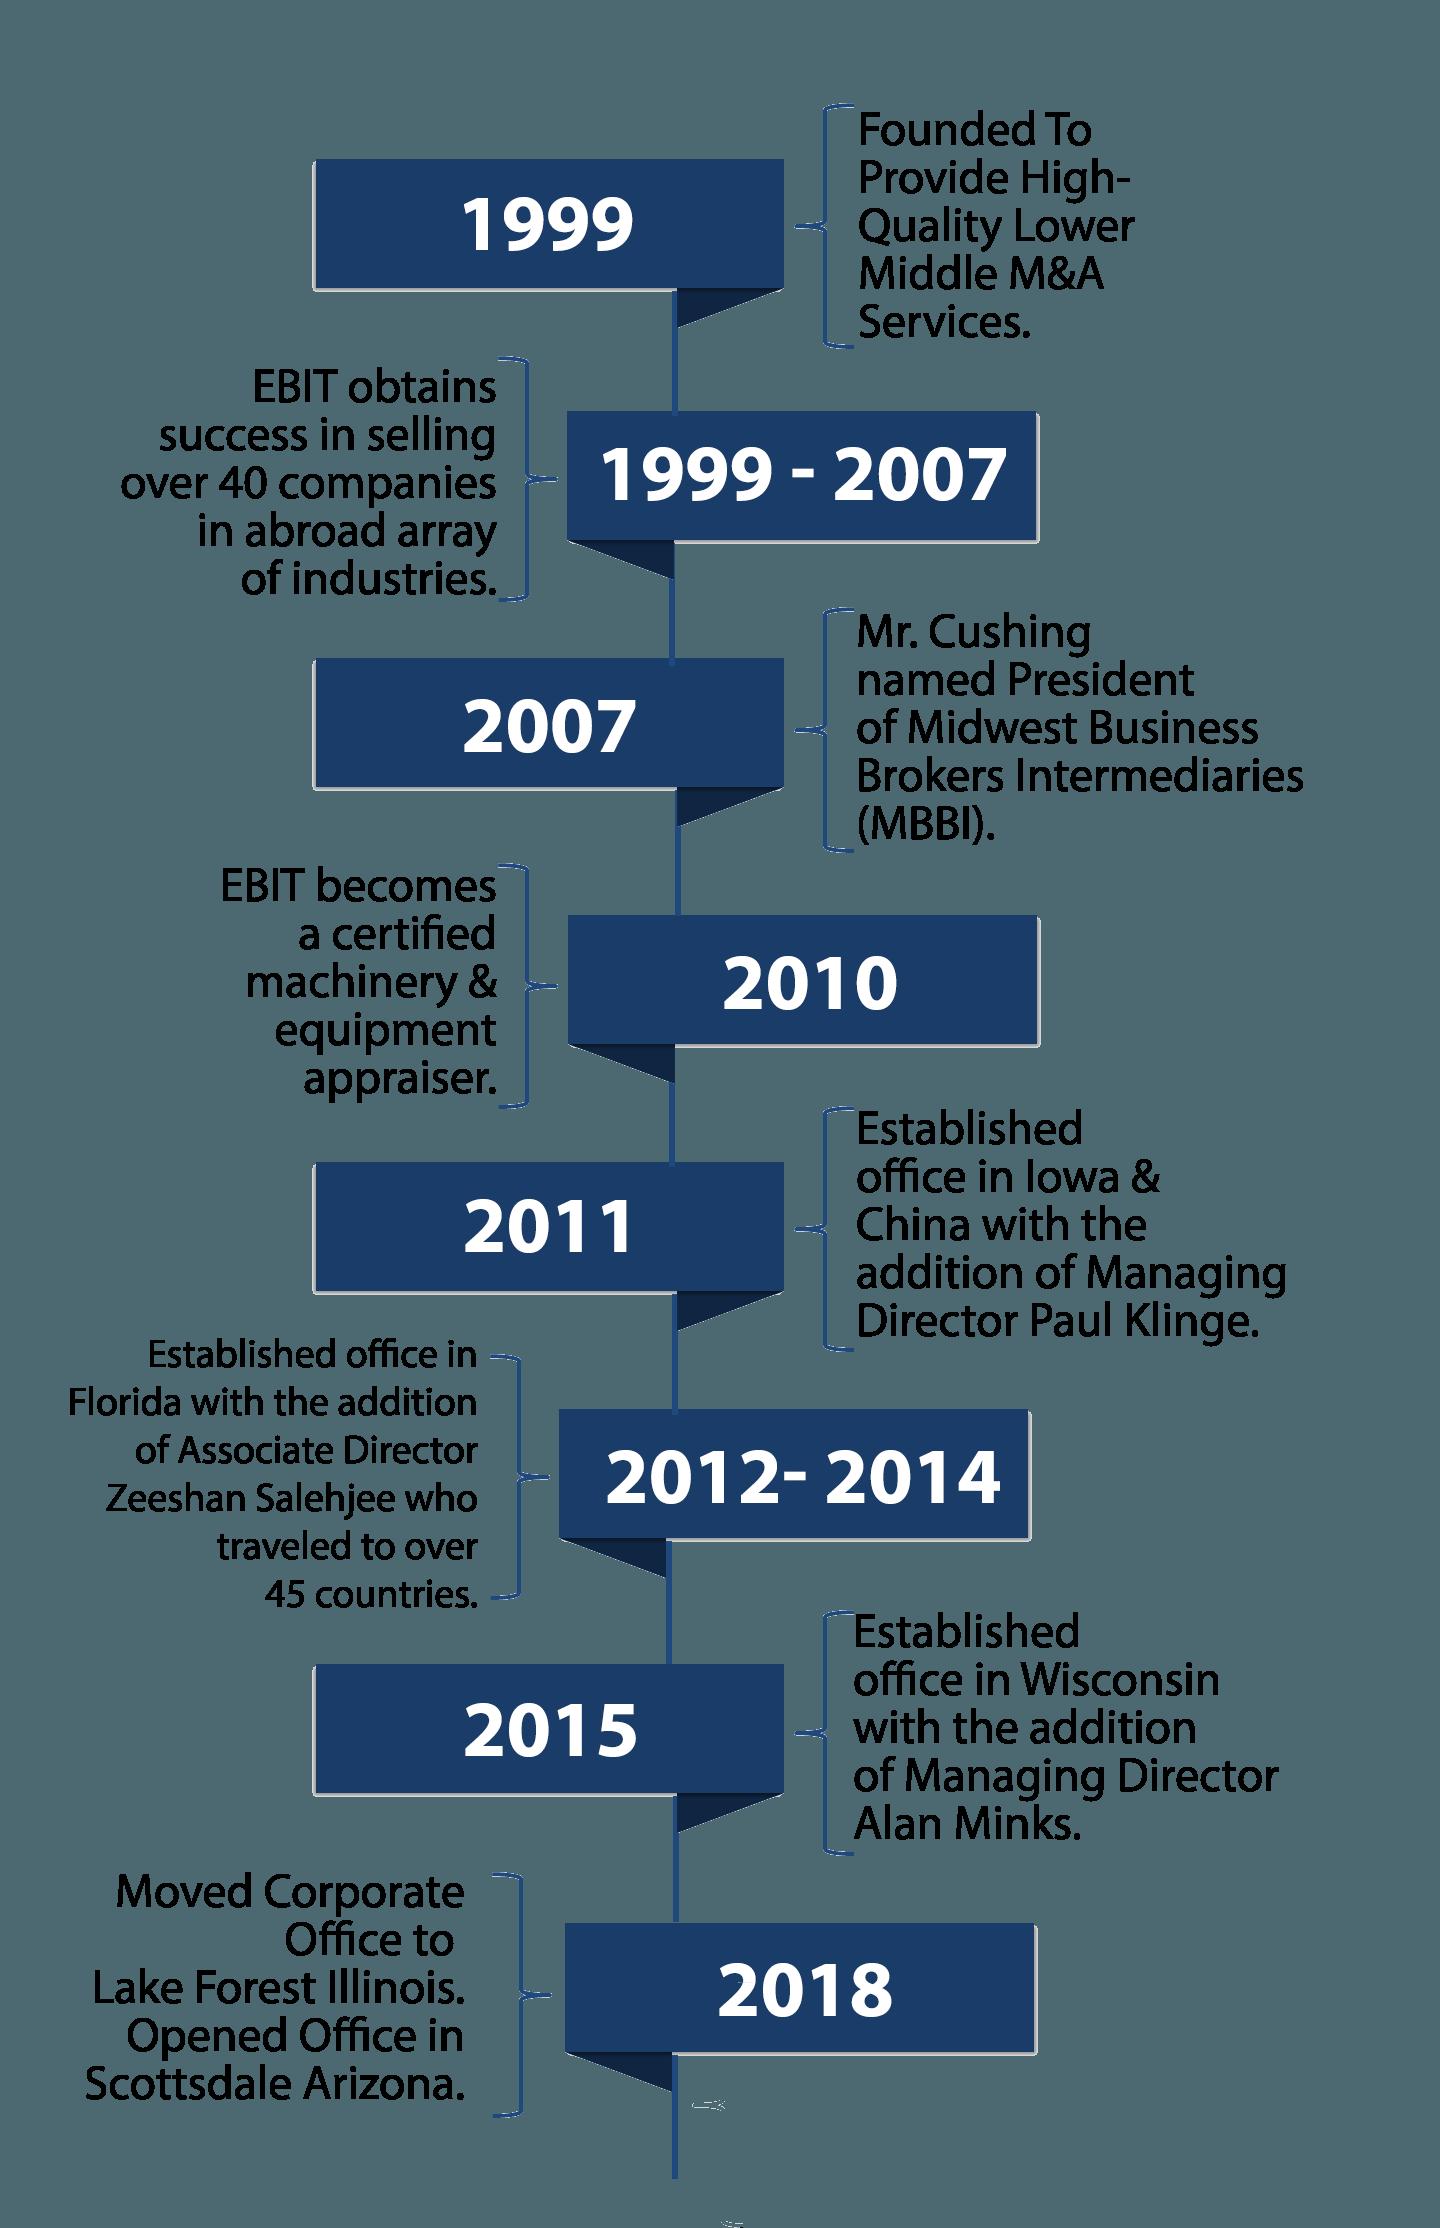 EBIT Associates Company History